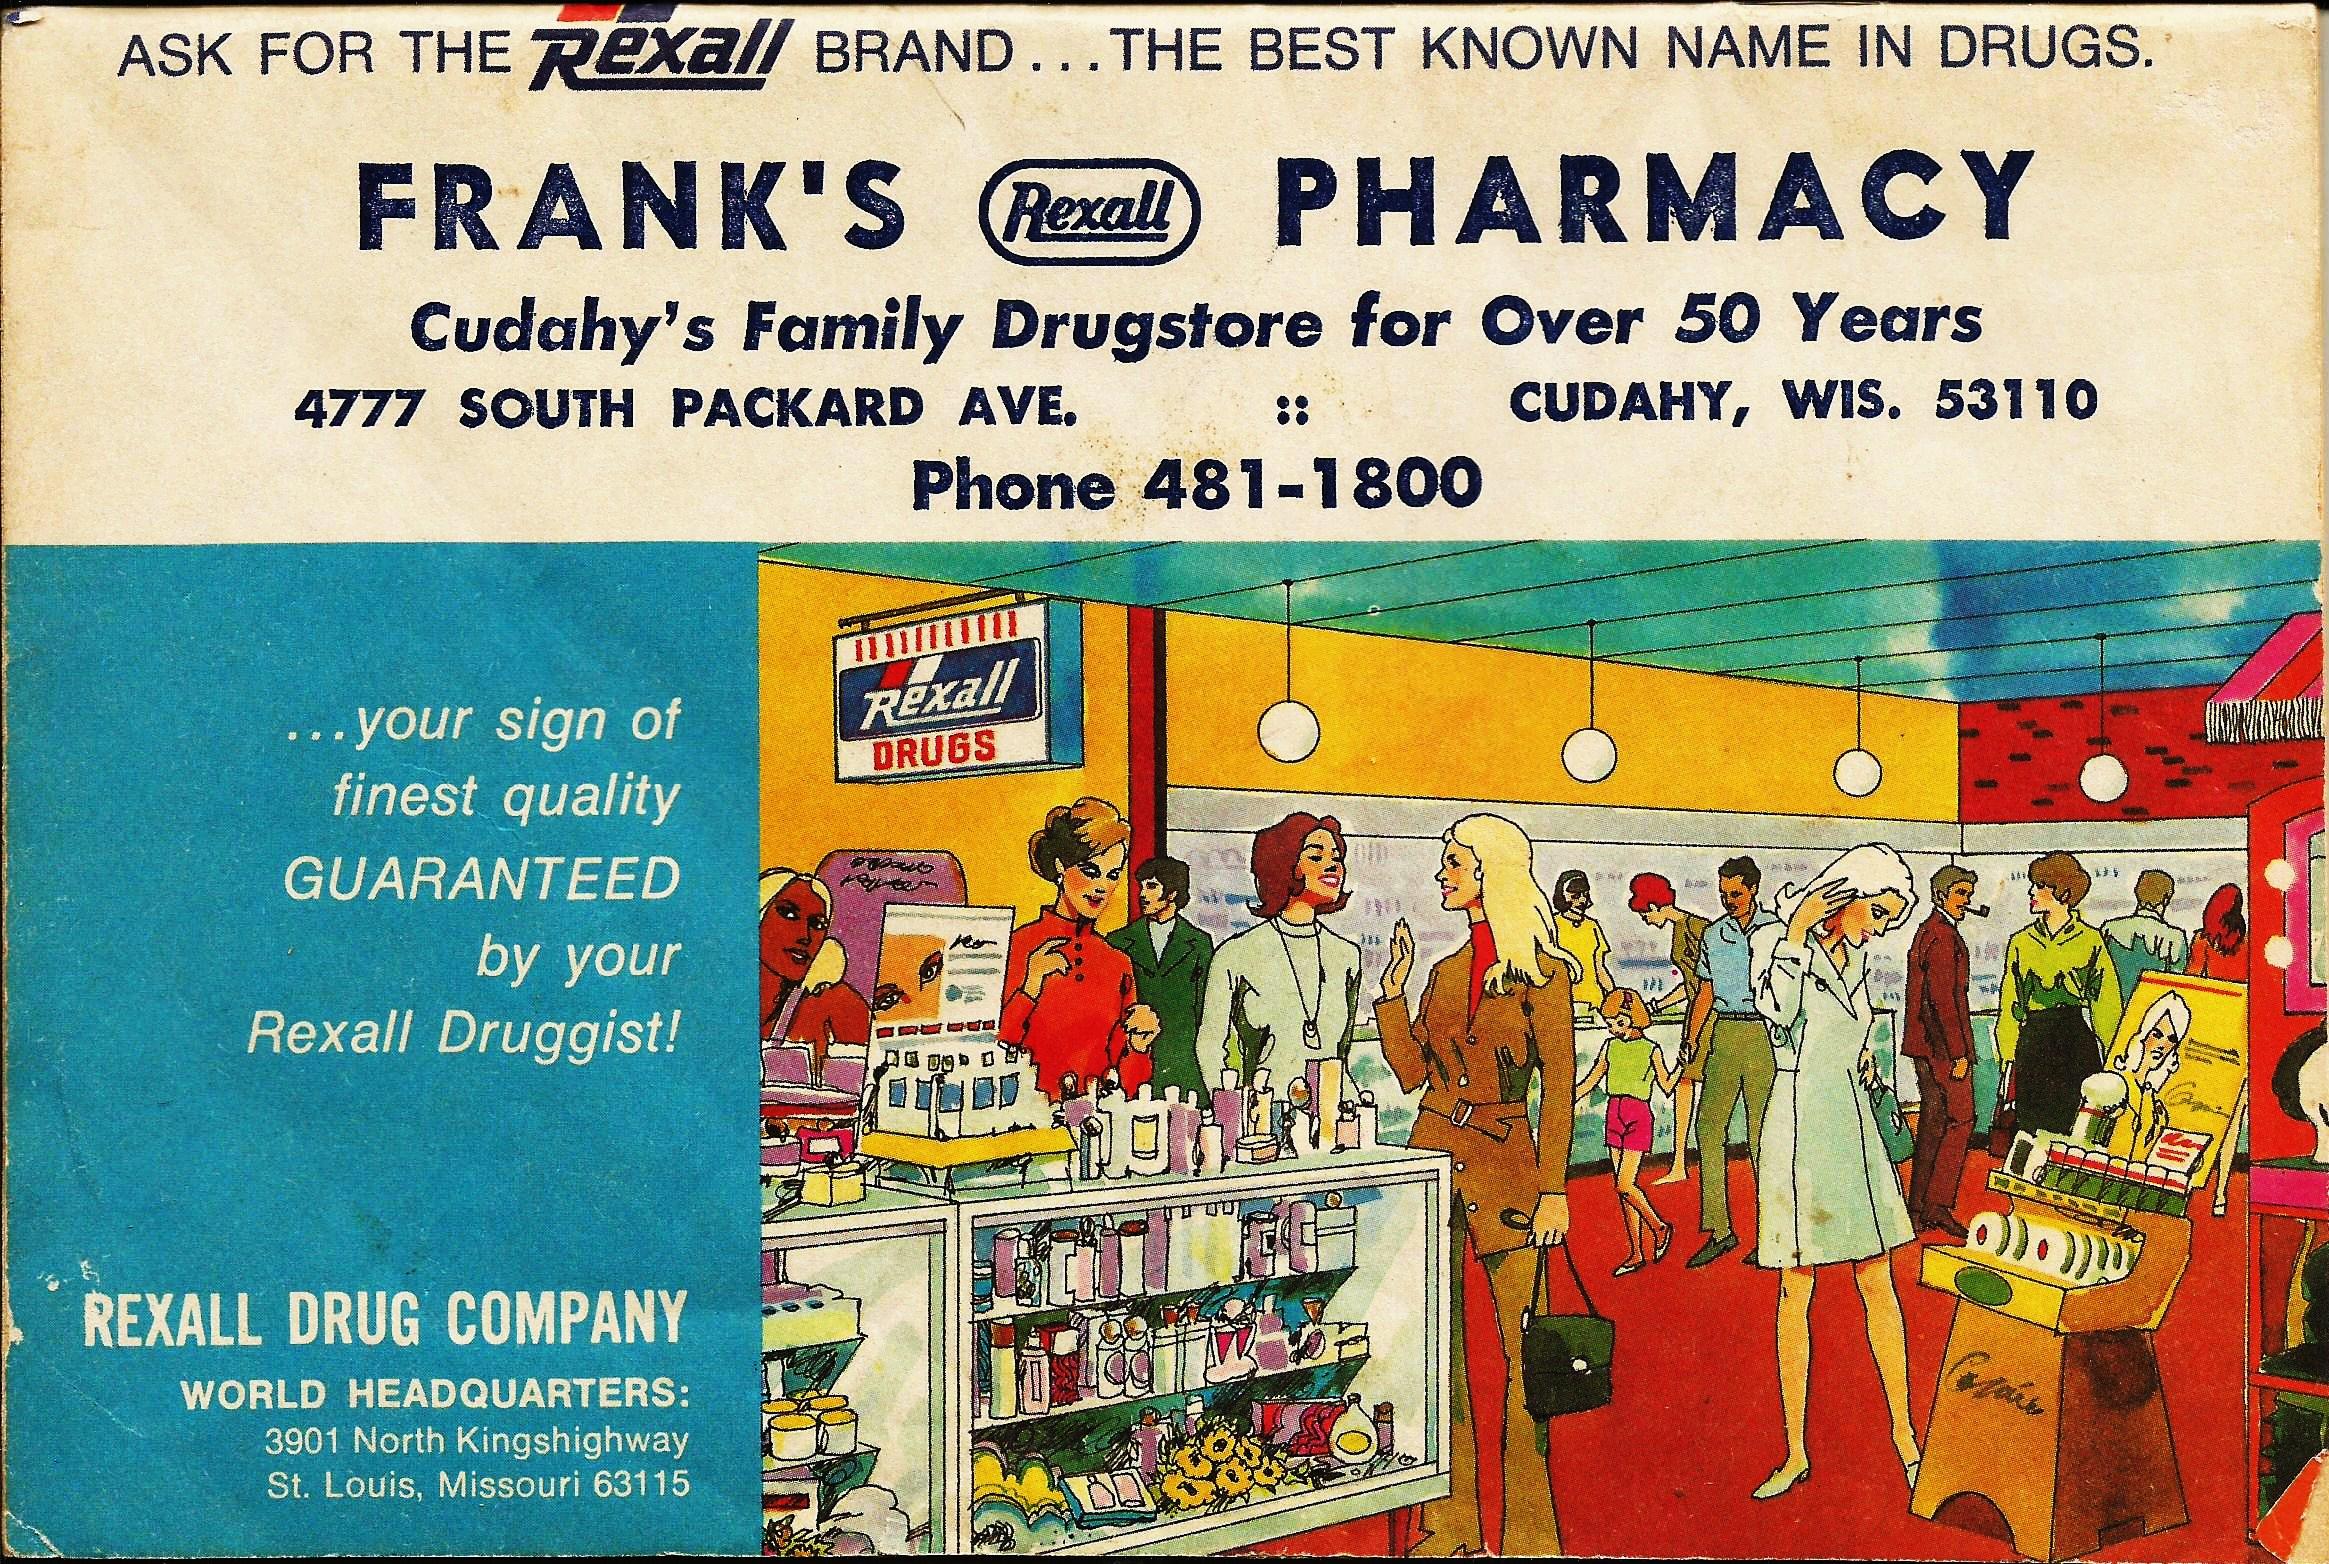 Frank's Rexall Pharmacy - 4777 South Packard Avenue, Cudahy, Wisconsin U.S.A. - 1973